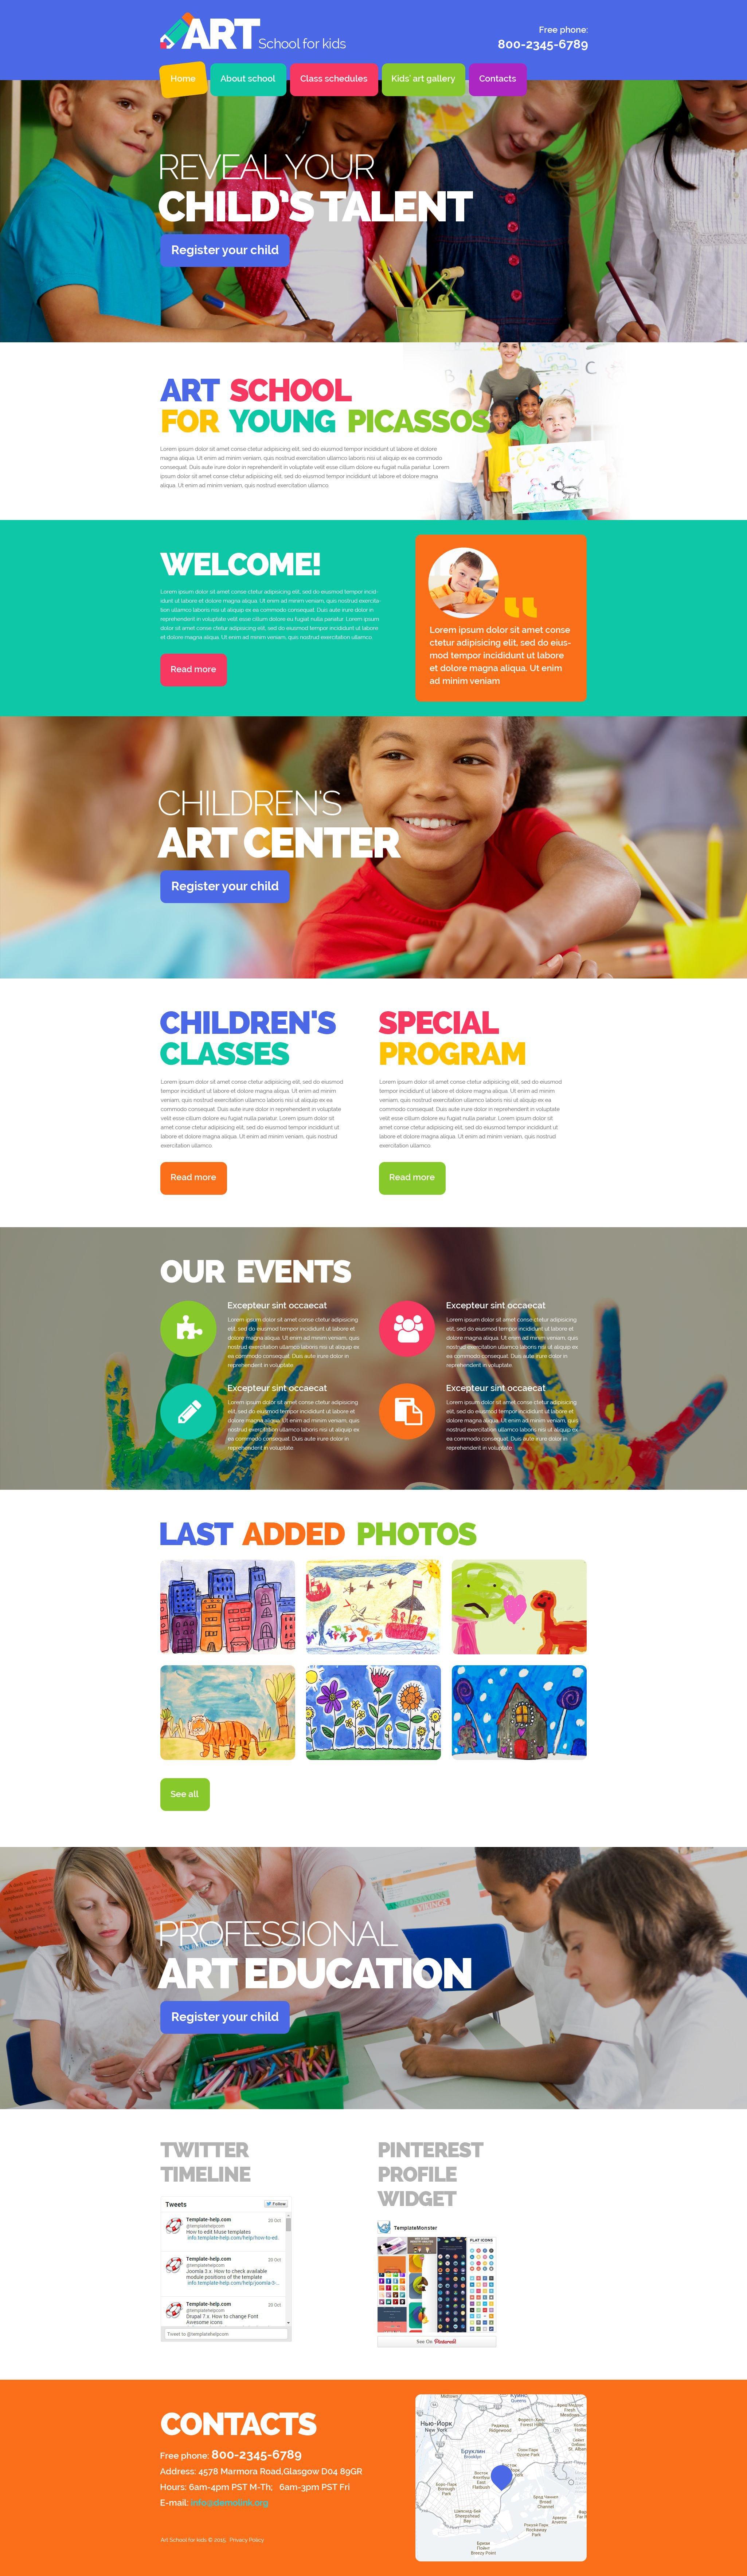 Children Art School №54875 - скриншот